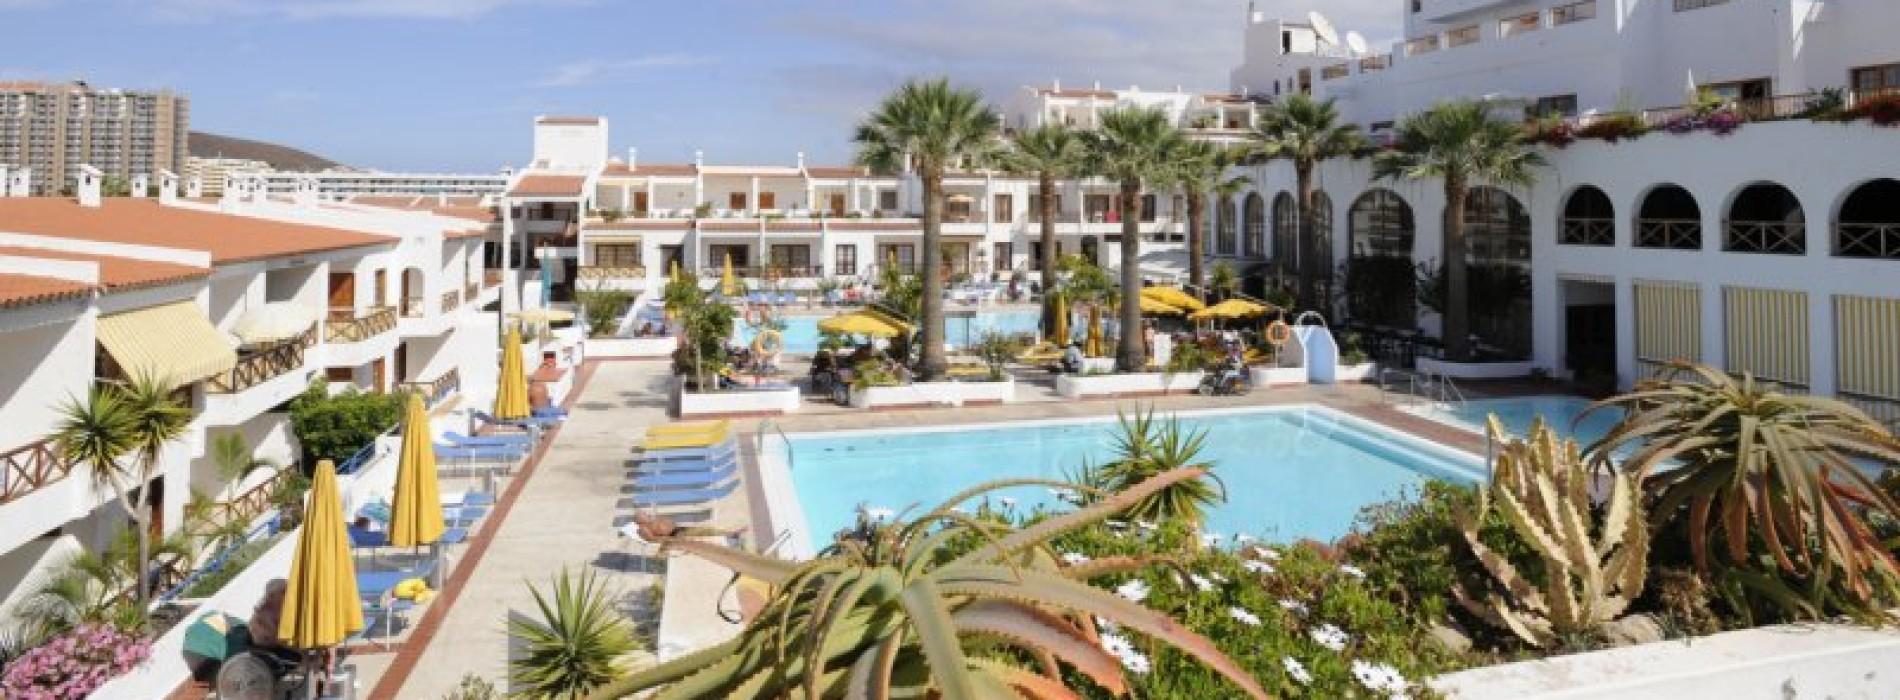 Mar y Sol hotel: Accessible holidays in Tenerife